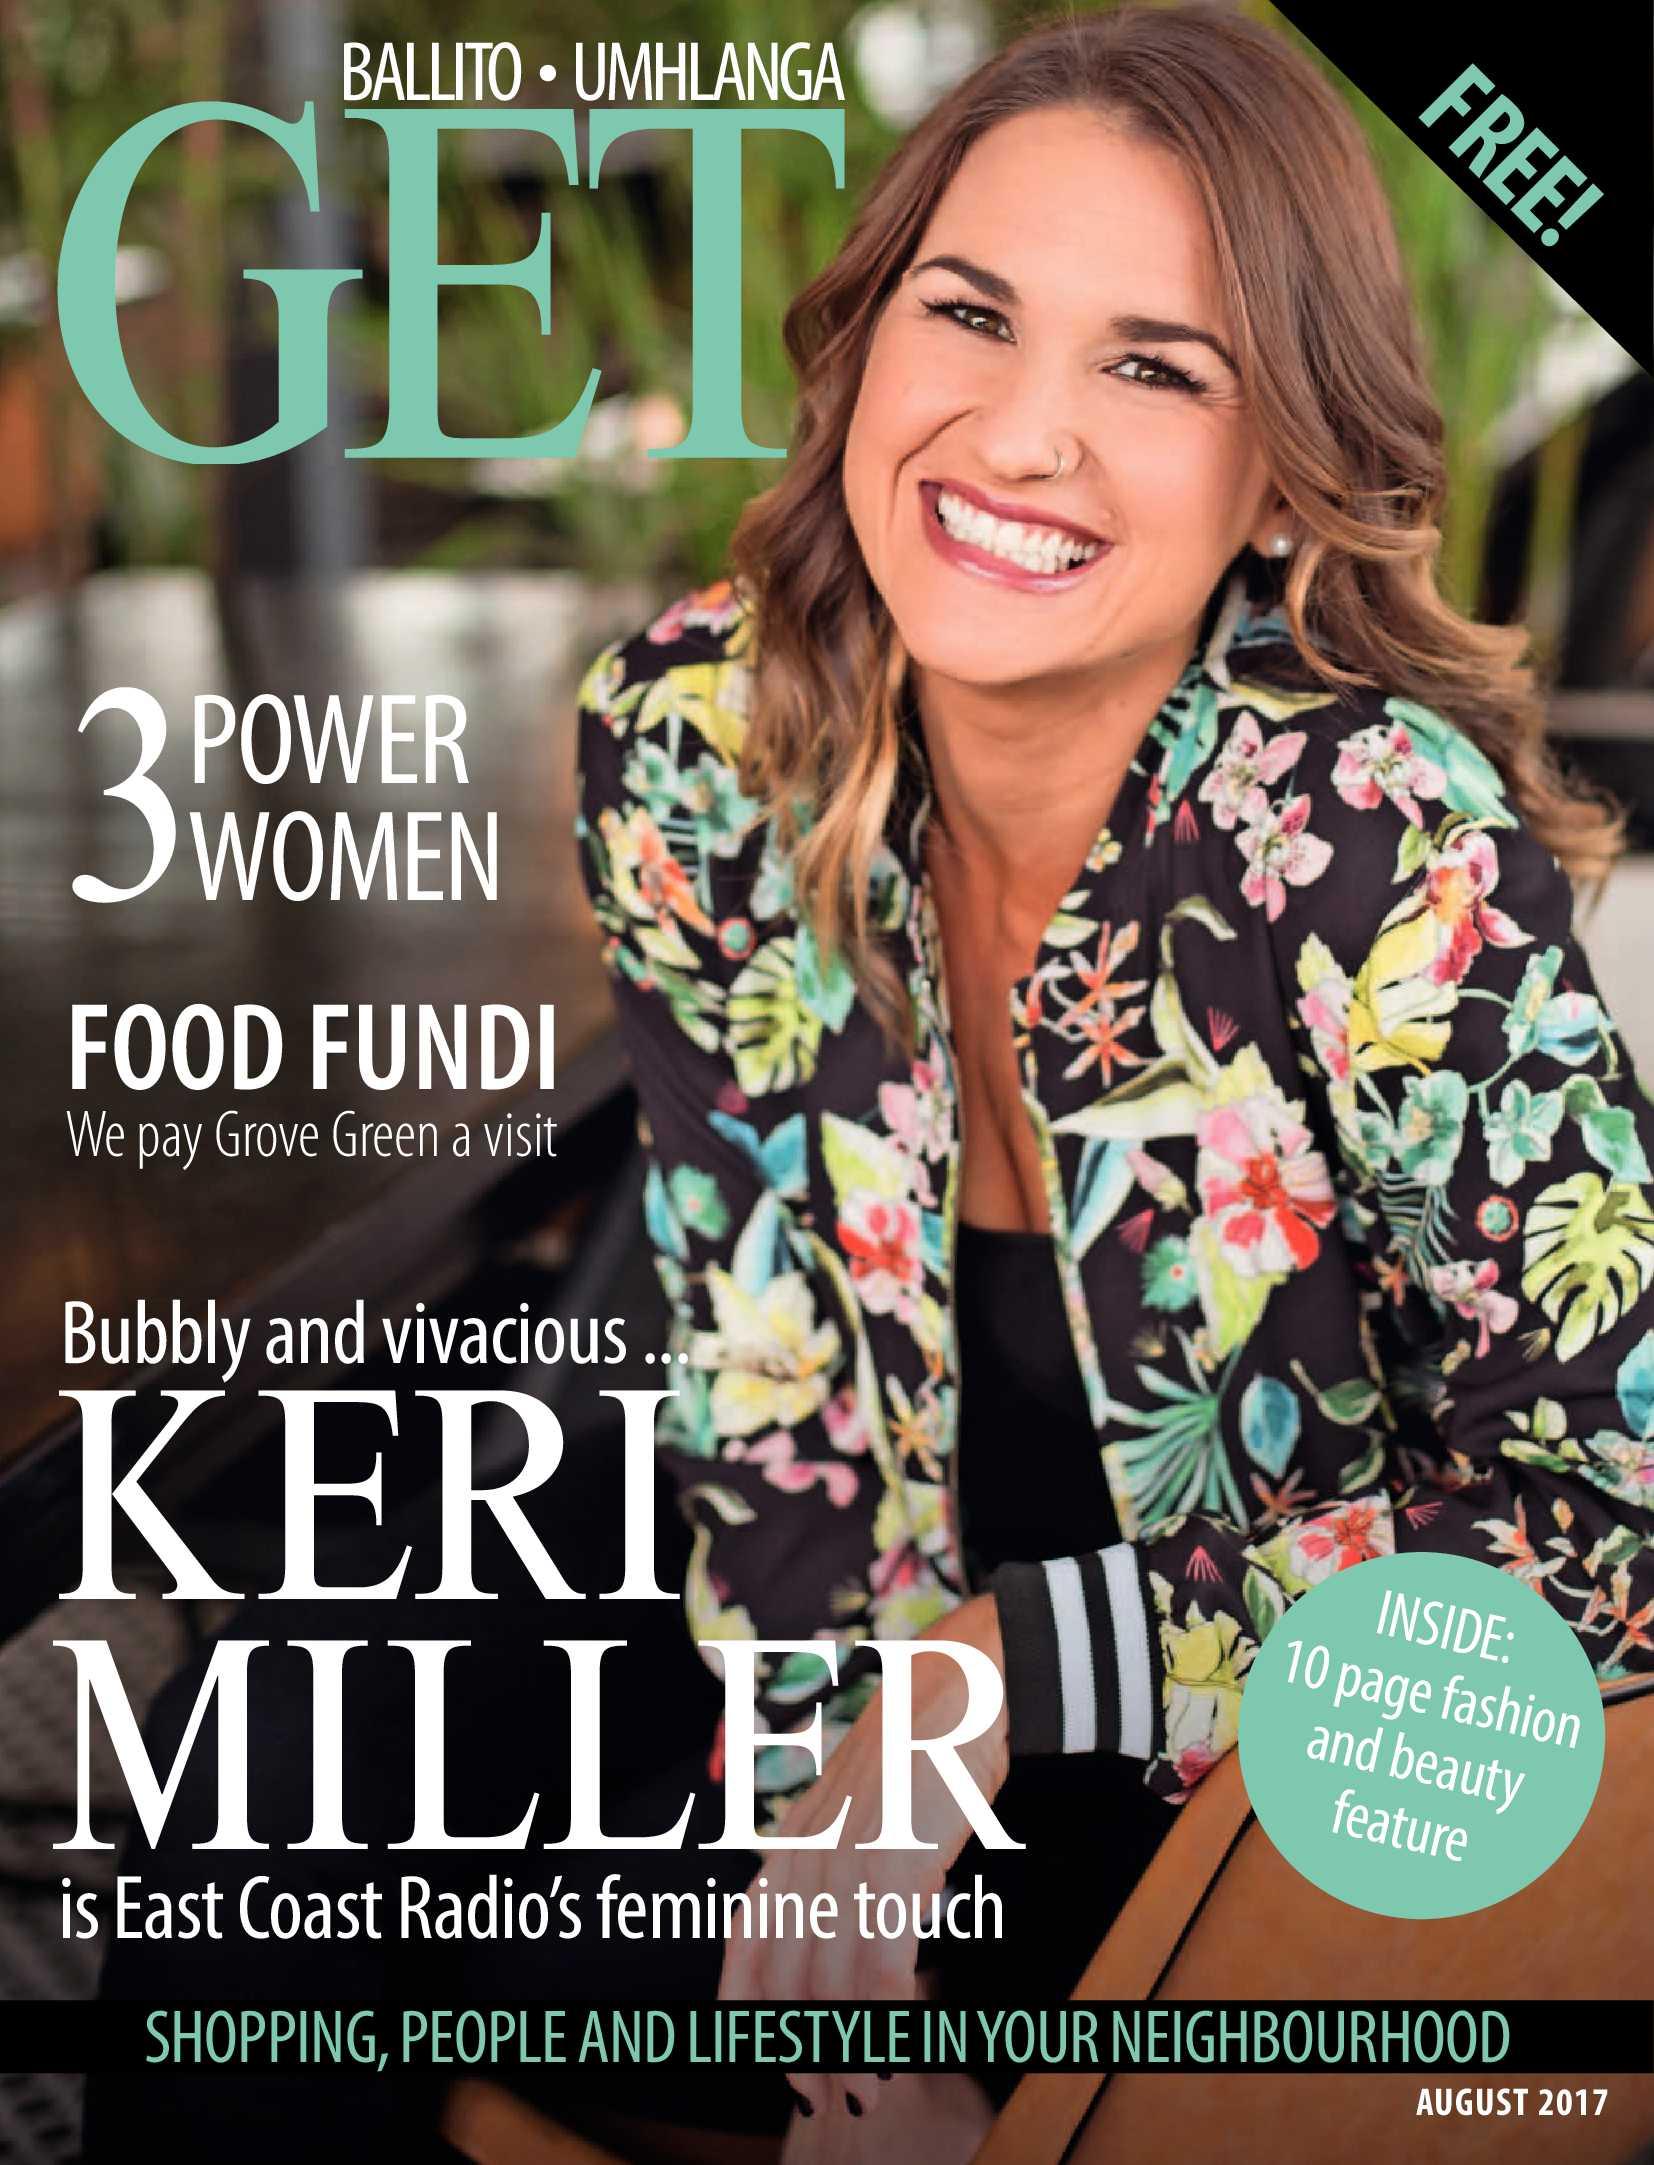 get-magazine-ballitoumhlanga-august-2017-epapers-page-1